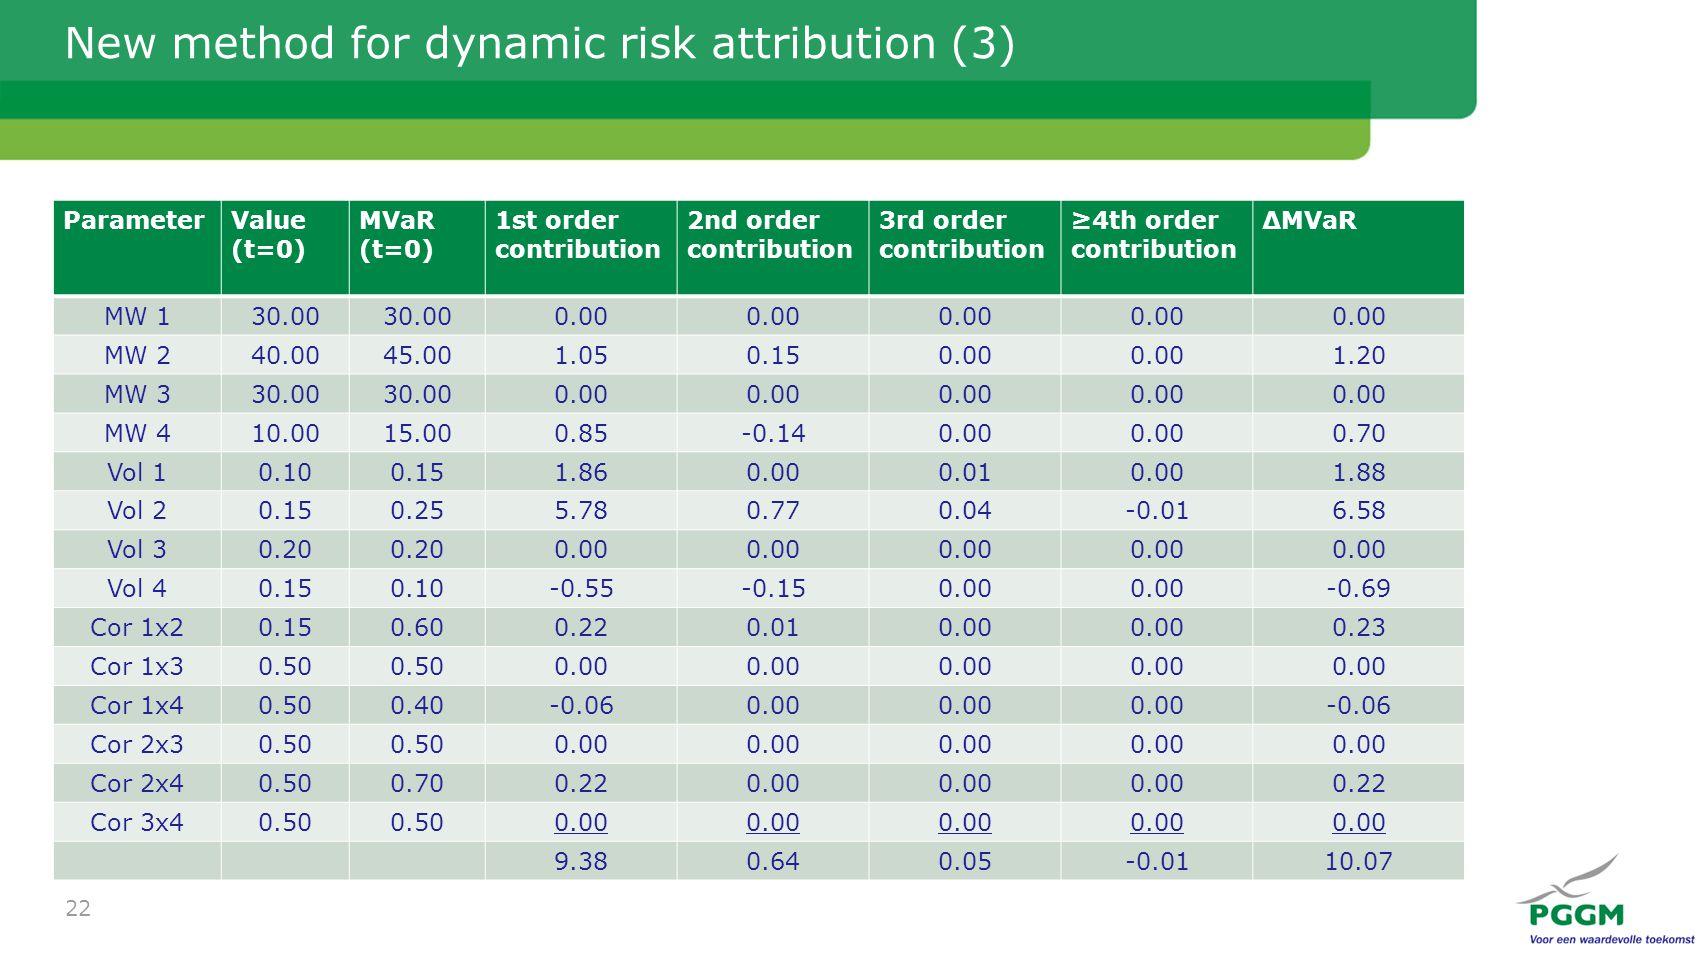 New method for dynamic risk attribution (3) ParameterValue (t=0) MVaR (t=0) 1st order contribution 2nd order contribution 3rd order contribution ≥4th order contribution ΔMVaR MW 130.00 0.00 MW 240.0045.001.050.150.00 1.20 MW 330.00 0.00 MW 410.0015.000.85-0.140.00 0.70 Vol 10.100.151.860.000.010.001.88 Vol 20.150.255.780.770.04-0.016.58 Vol 30.20 0.00 Vol 40.150.10-0.55-0.150.00 -0.69 Cor 1x20.150.600.220.010.00 0.23 Cor 1x30.50 0.00 Cor 1x40.500.40-0.060.00 -0.06 Cor 2x30.50 0.00 Cor 2x40.500.700.220.00 0.22 Cor 3x40.50 0.00 9.380.640.05-0.0110.07 22